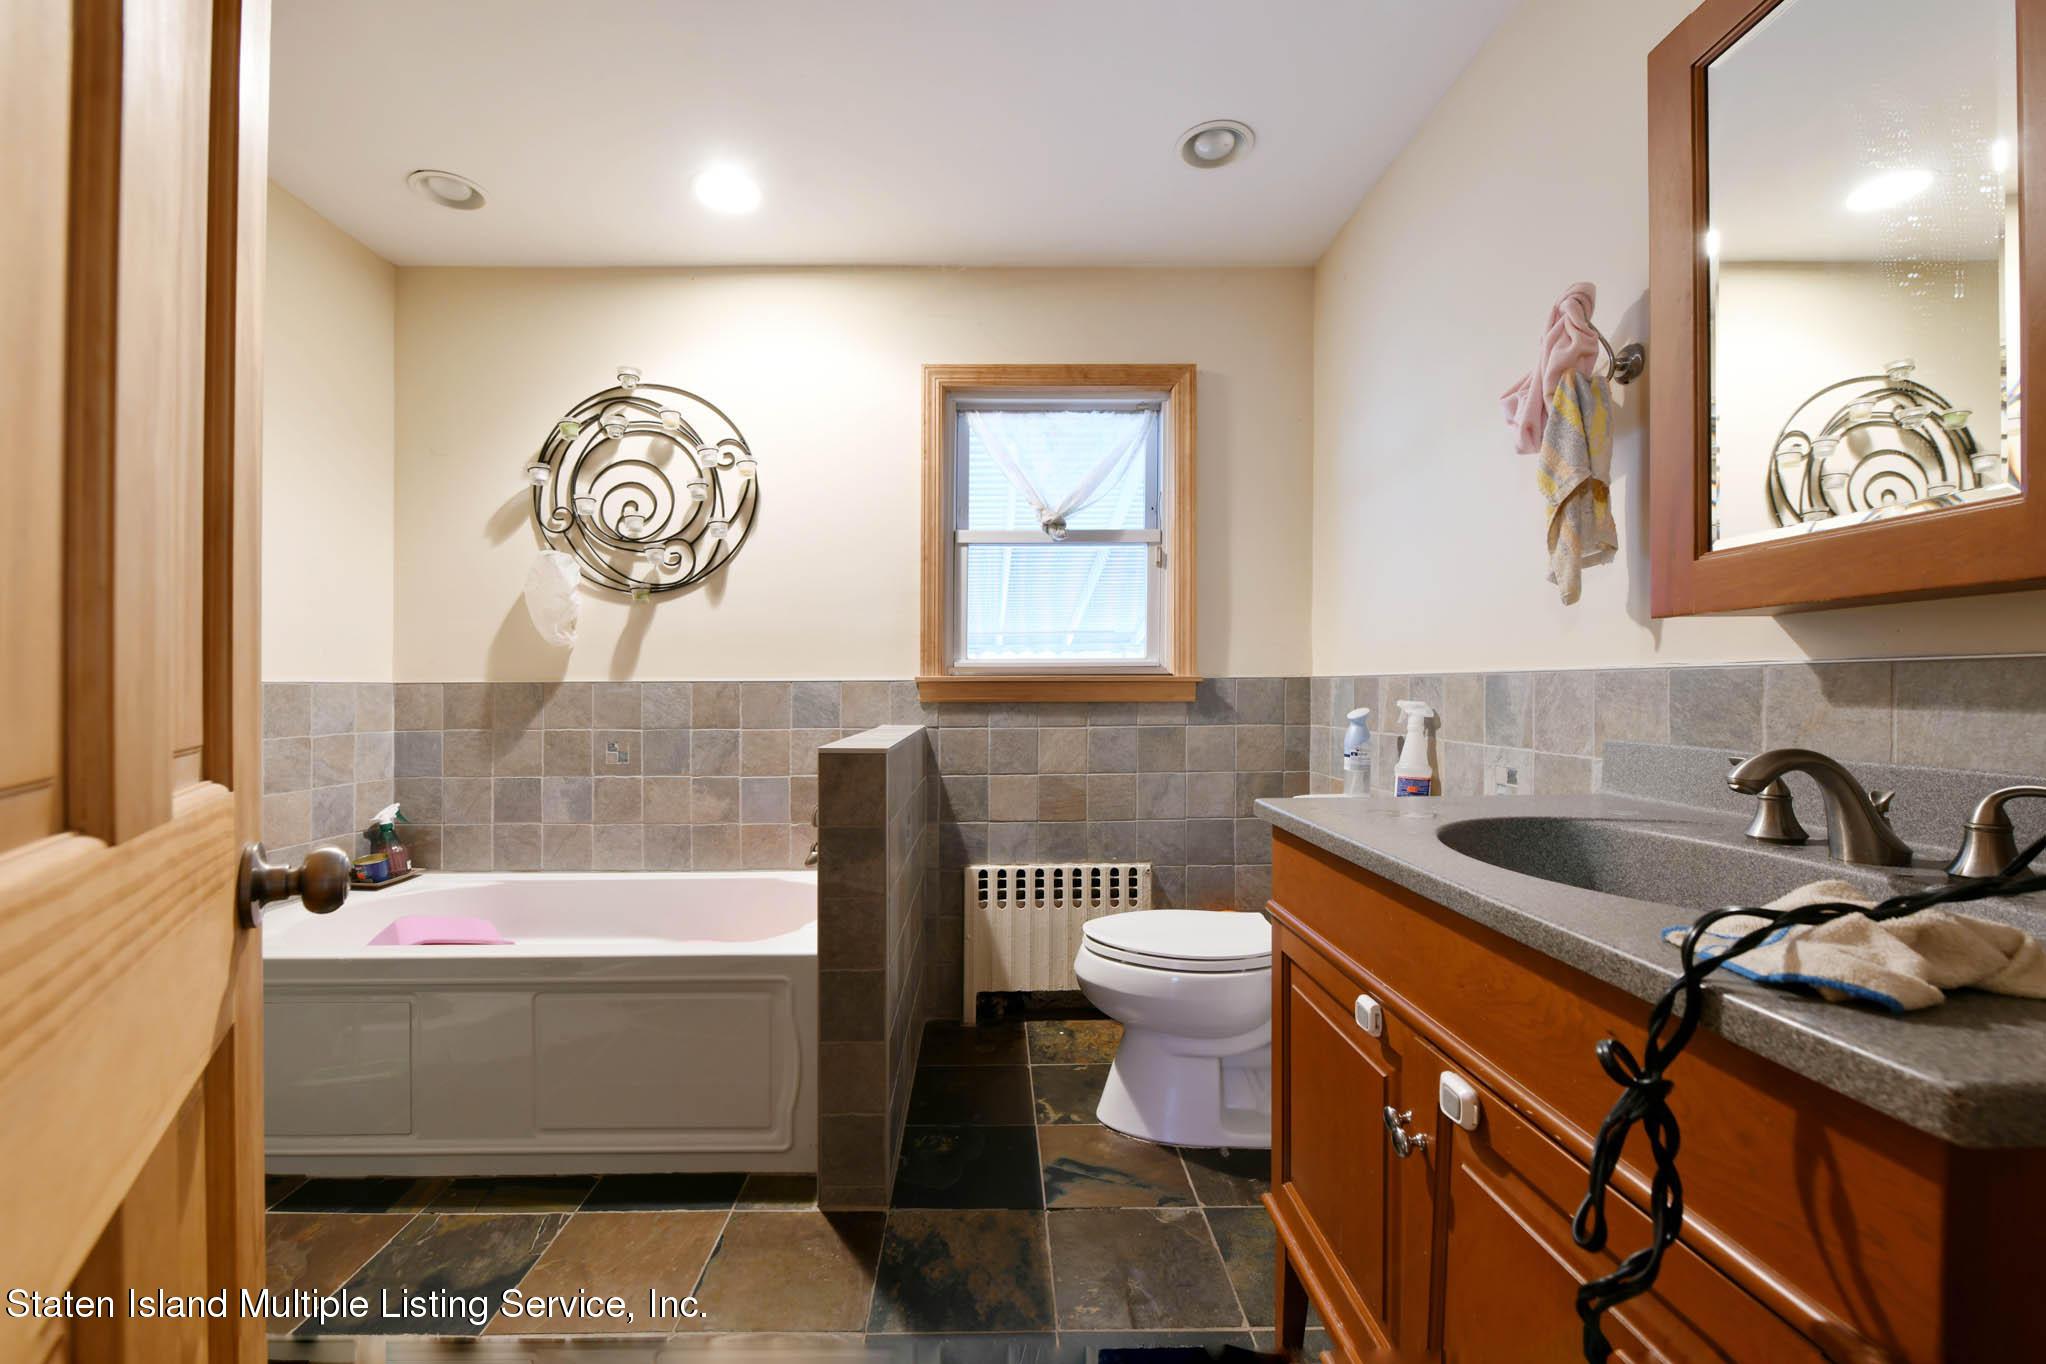 Single Family - Detached 110 Ravenhurst Avenue  Staten Island, NY 10310, MLS-1143189-7